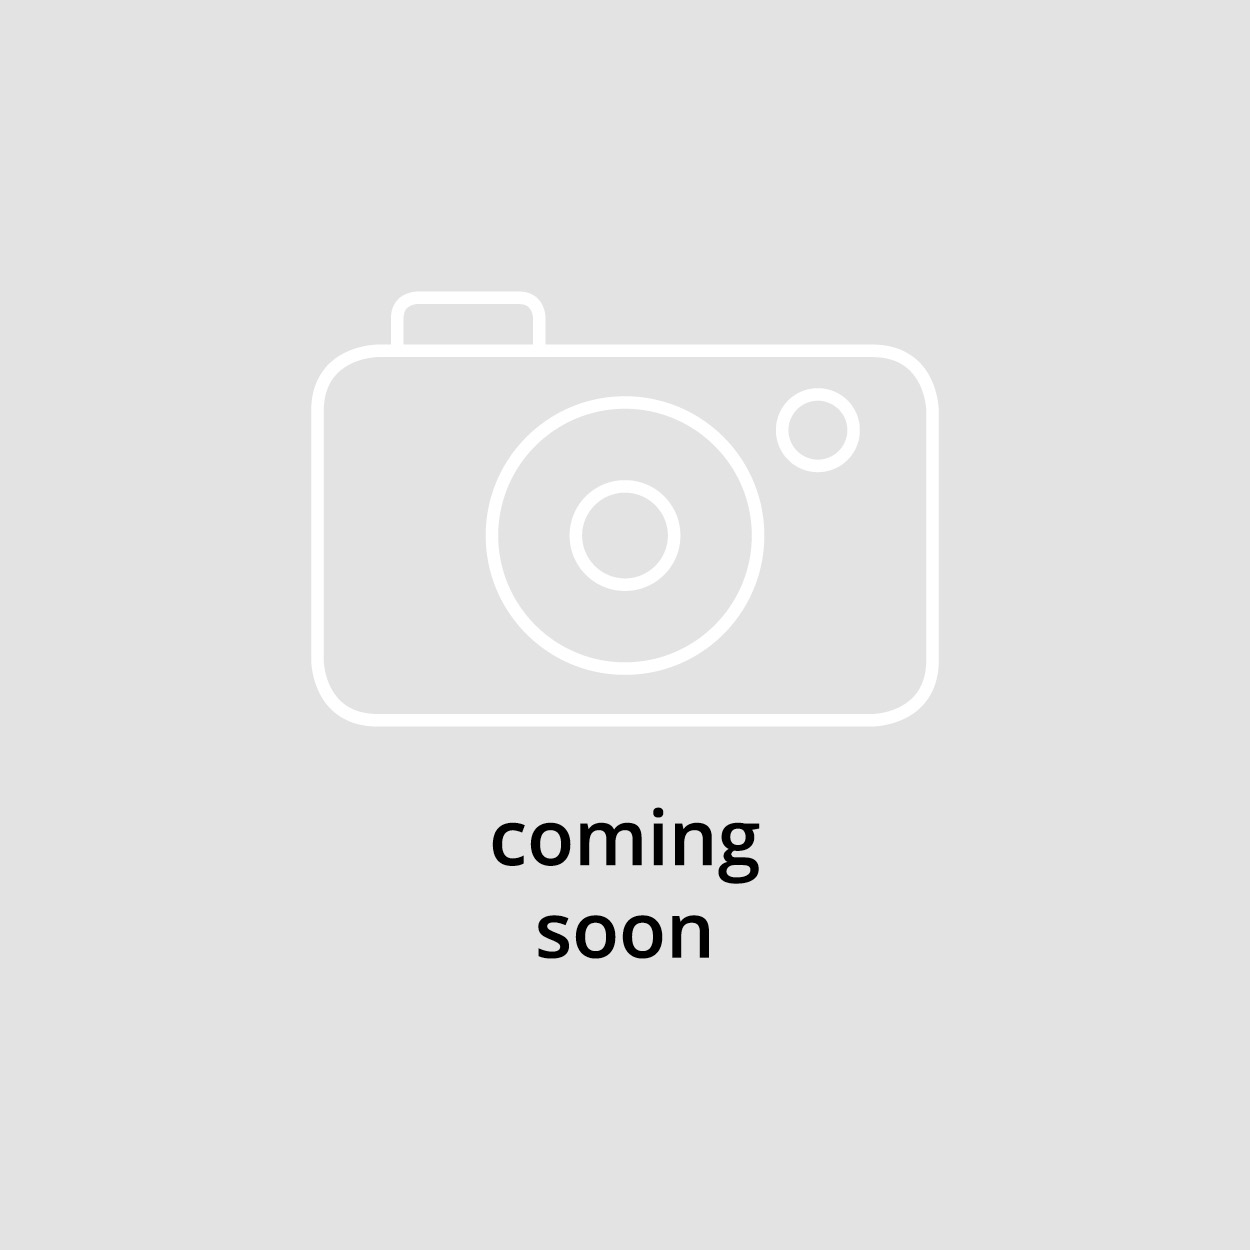 3522116 Rullino slitta radiale pos. 4-5 per Gildemeister GM 35